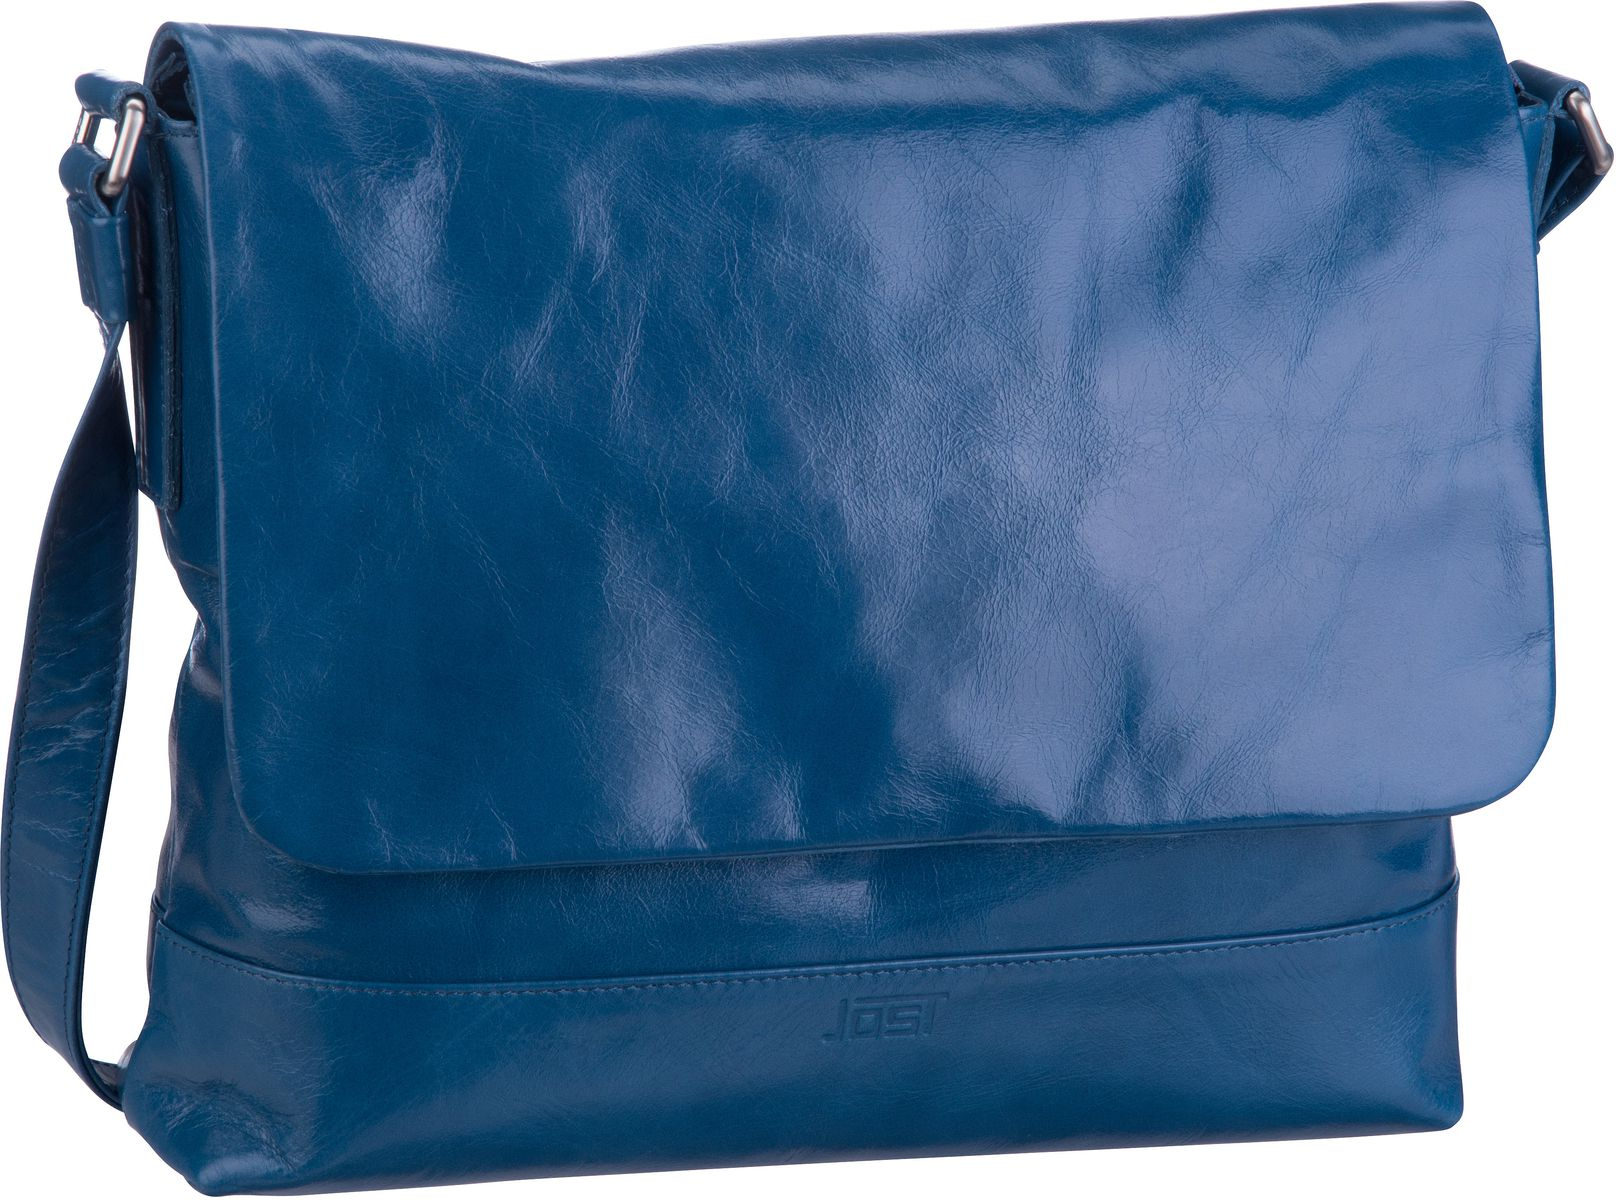 Umhängetasche Boda 6623 Shoulder Bag M Royalblue